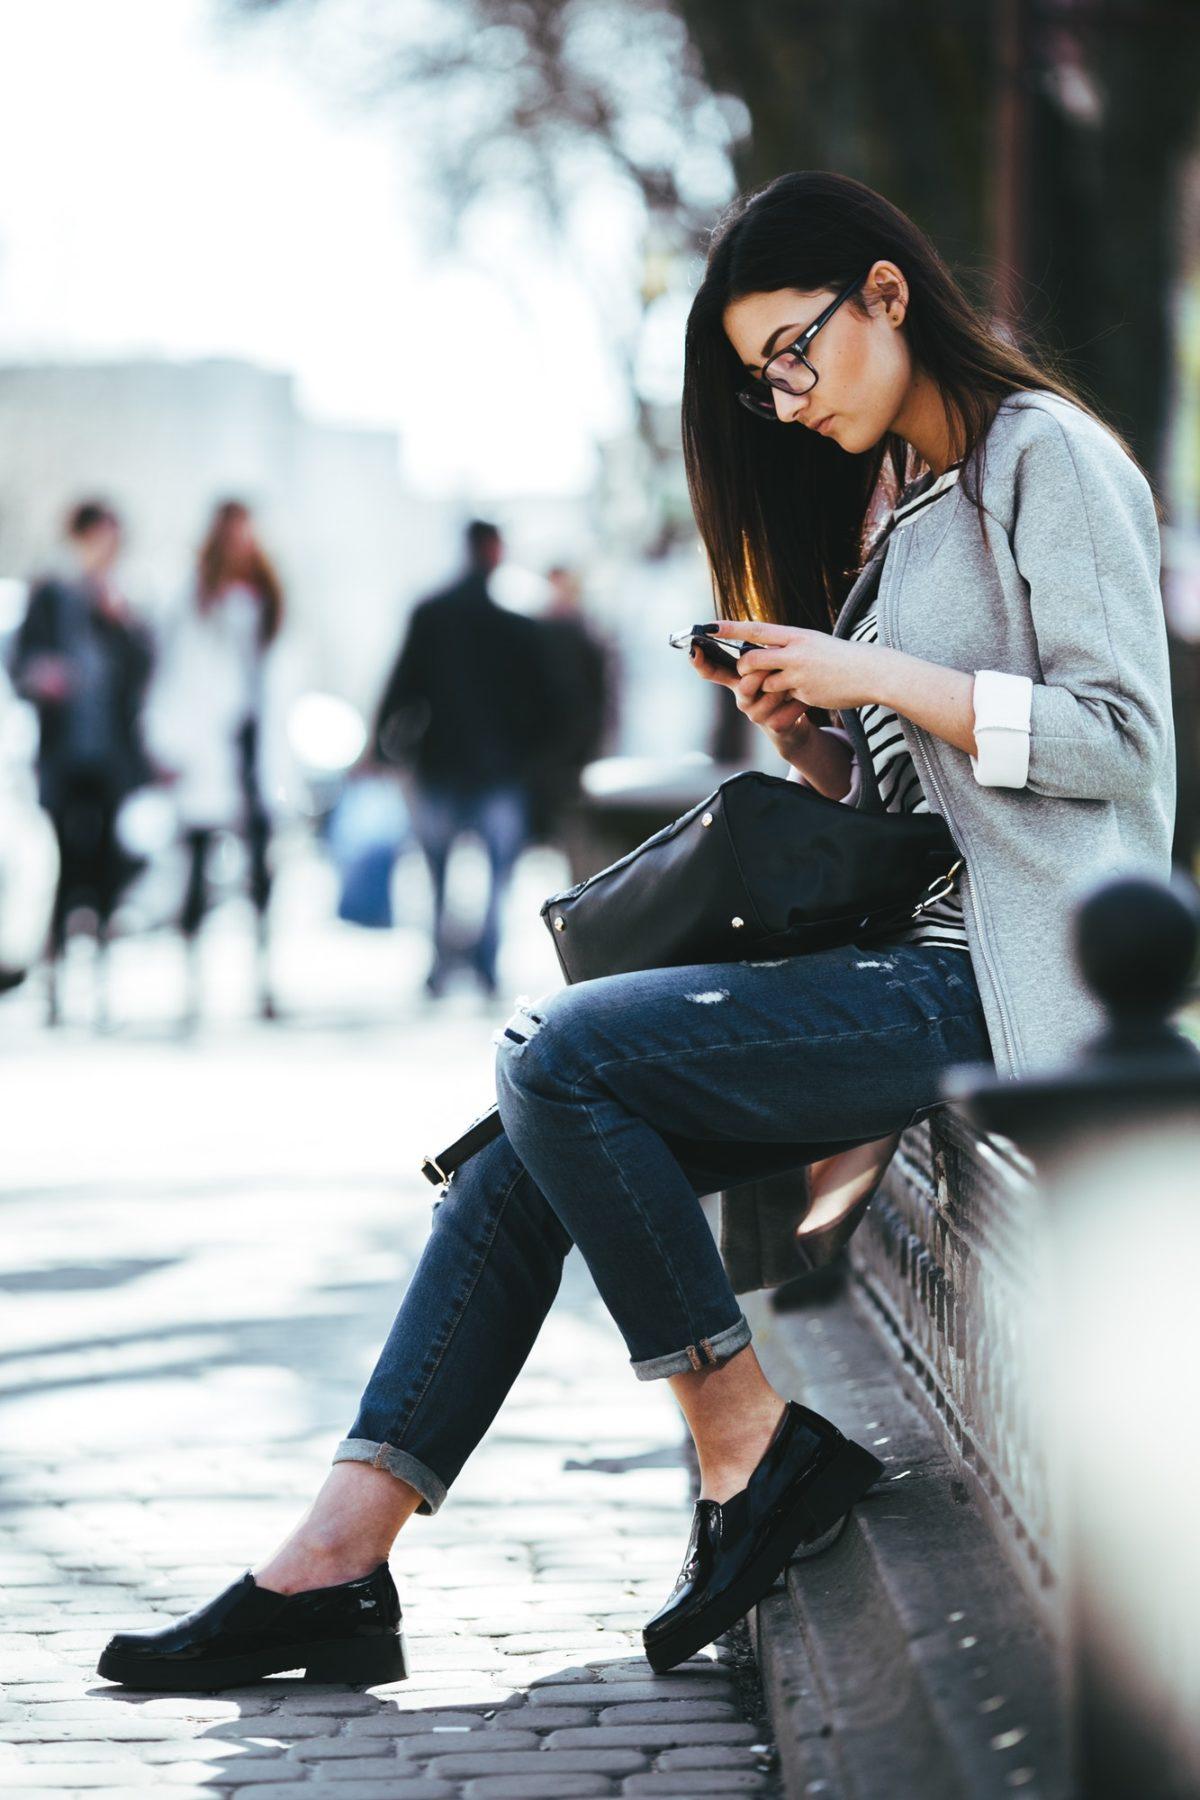 Beautiful fashion model in glasses sits